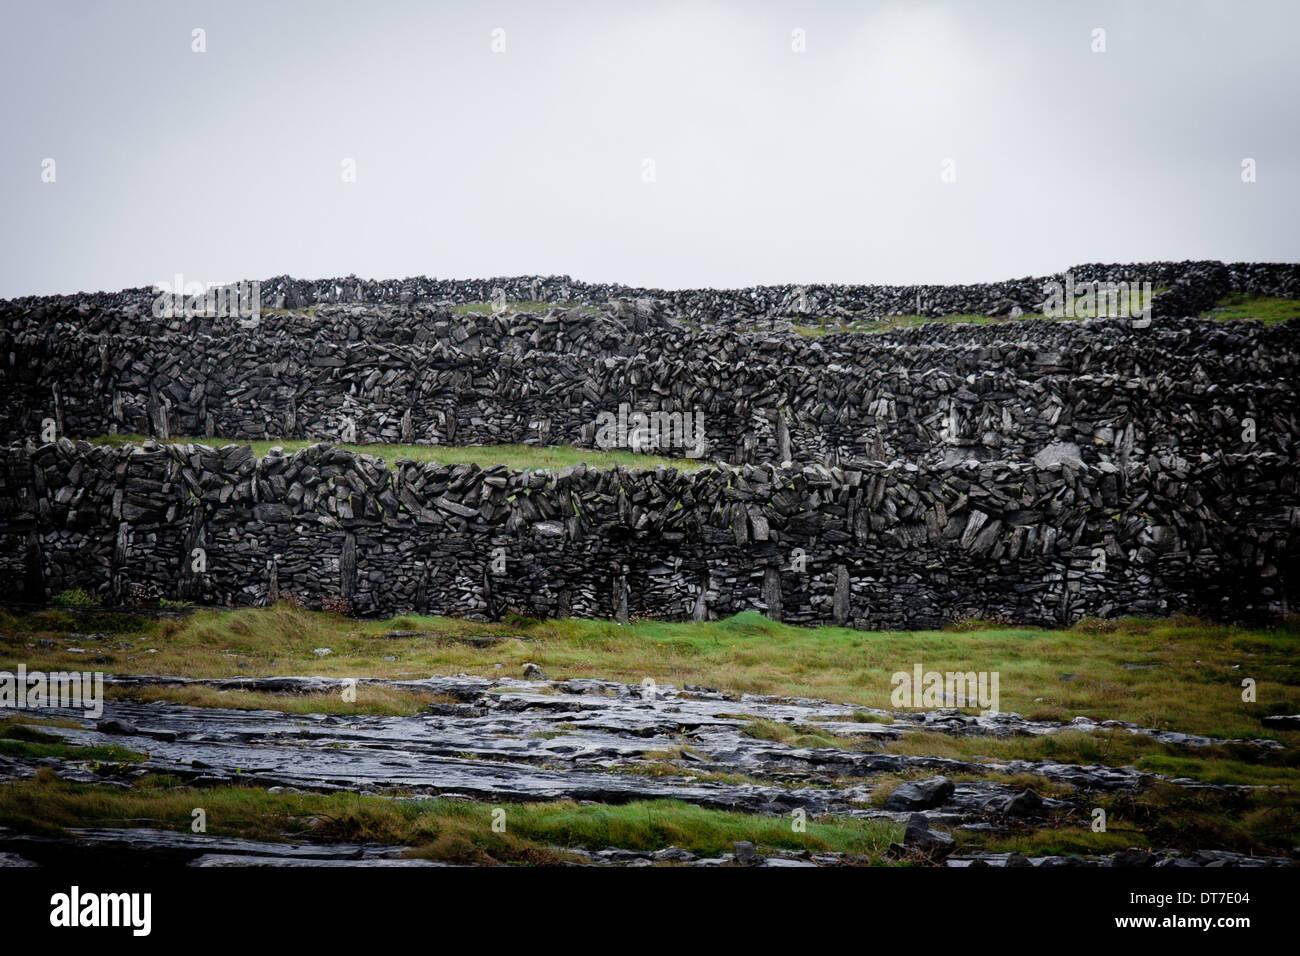 Stone walls fields rainy aran islands ireland galway west - Stock Image